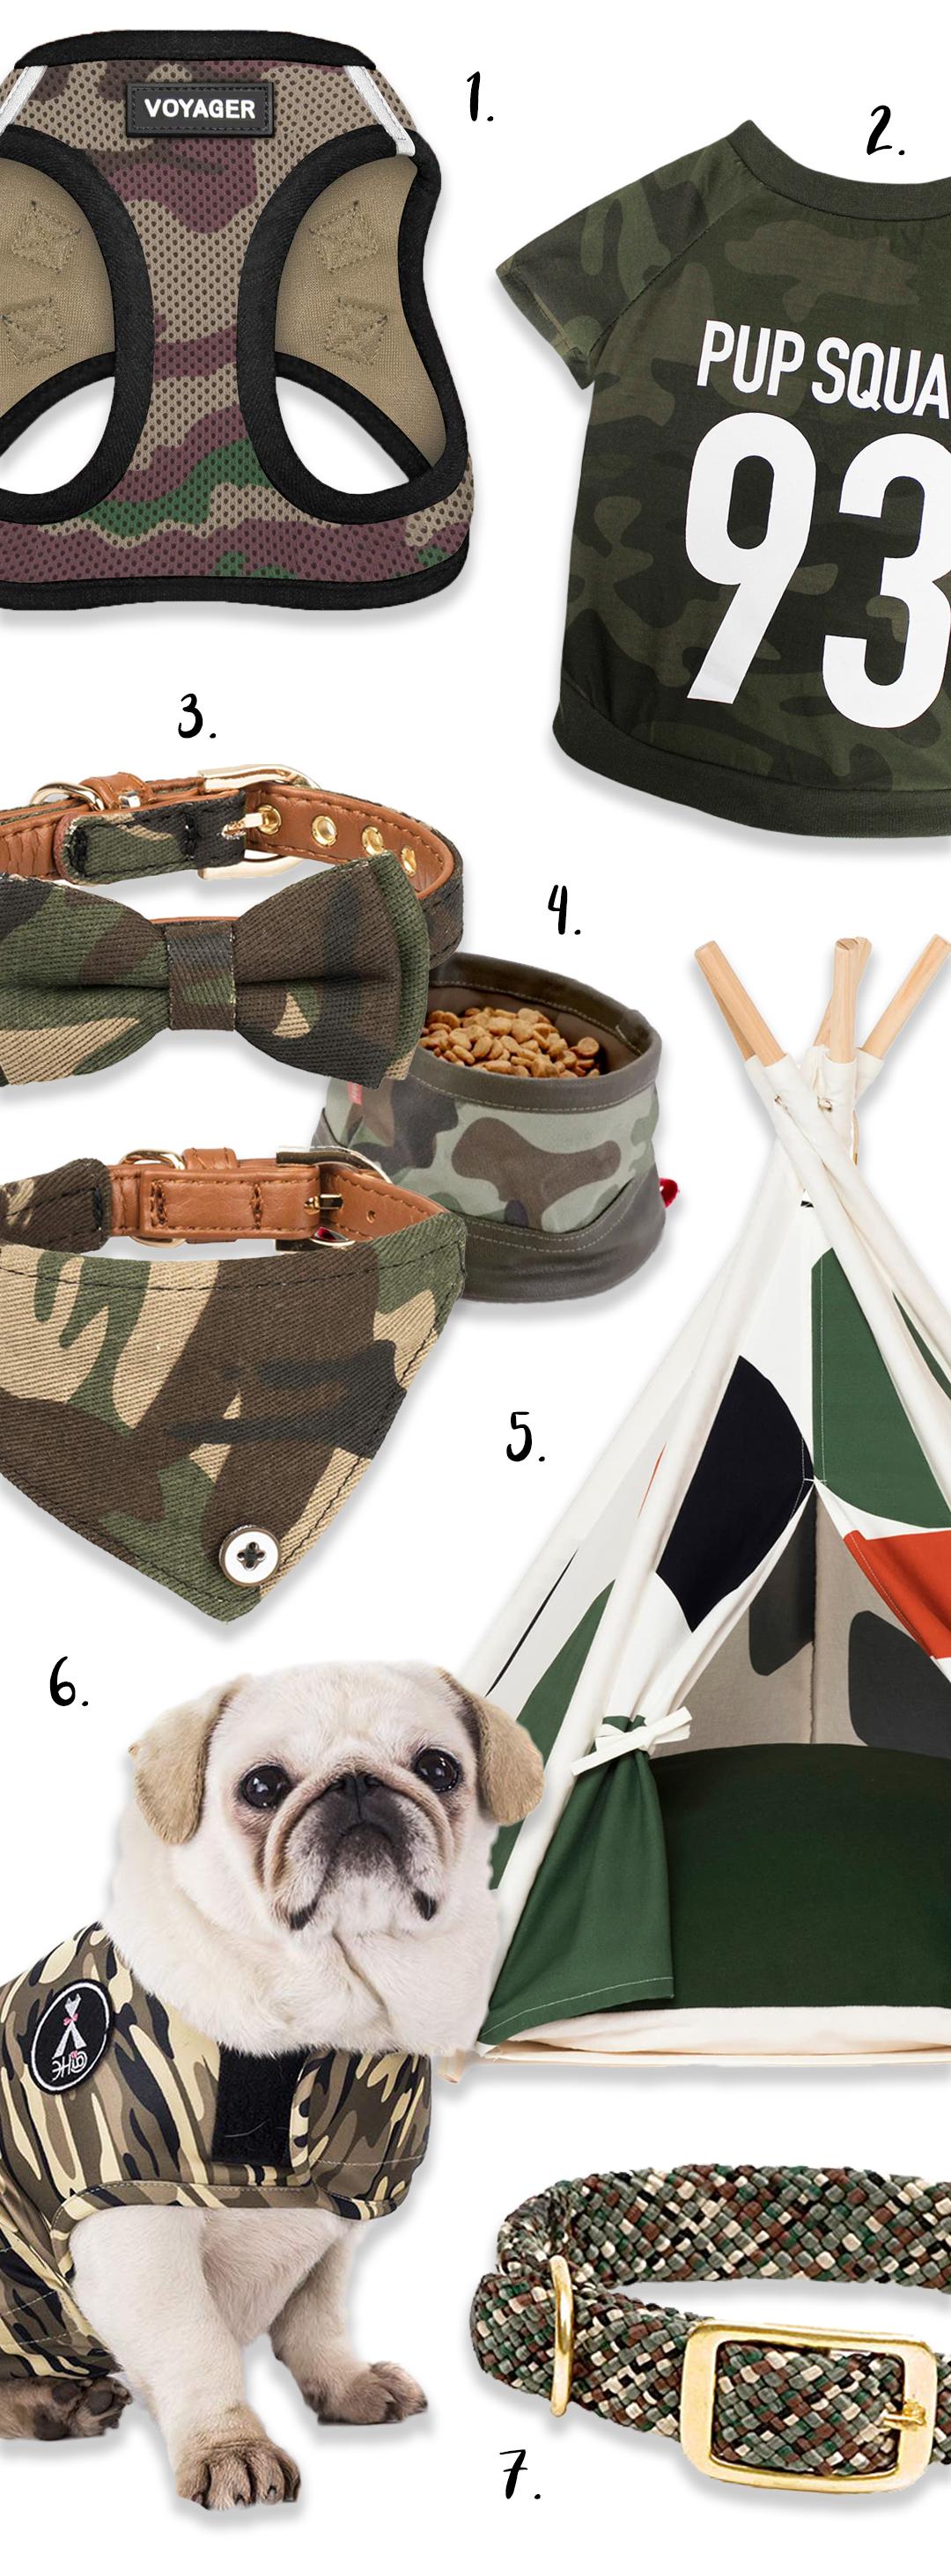 14 Stylish Camo Dog Shirts and Accessories - heydjangles.com - camouflage print dog gear, camo dog clothing, camo dog accessories. #camouflage #doglover